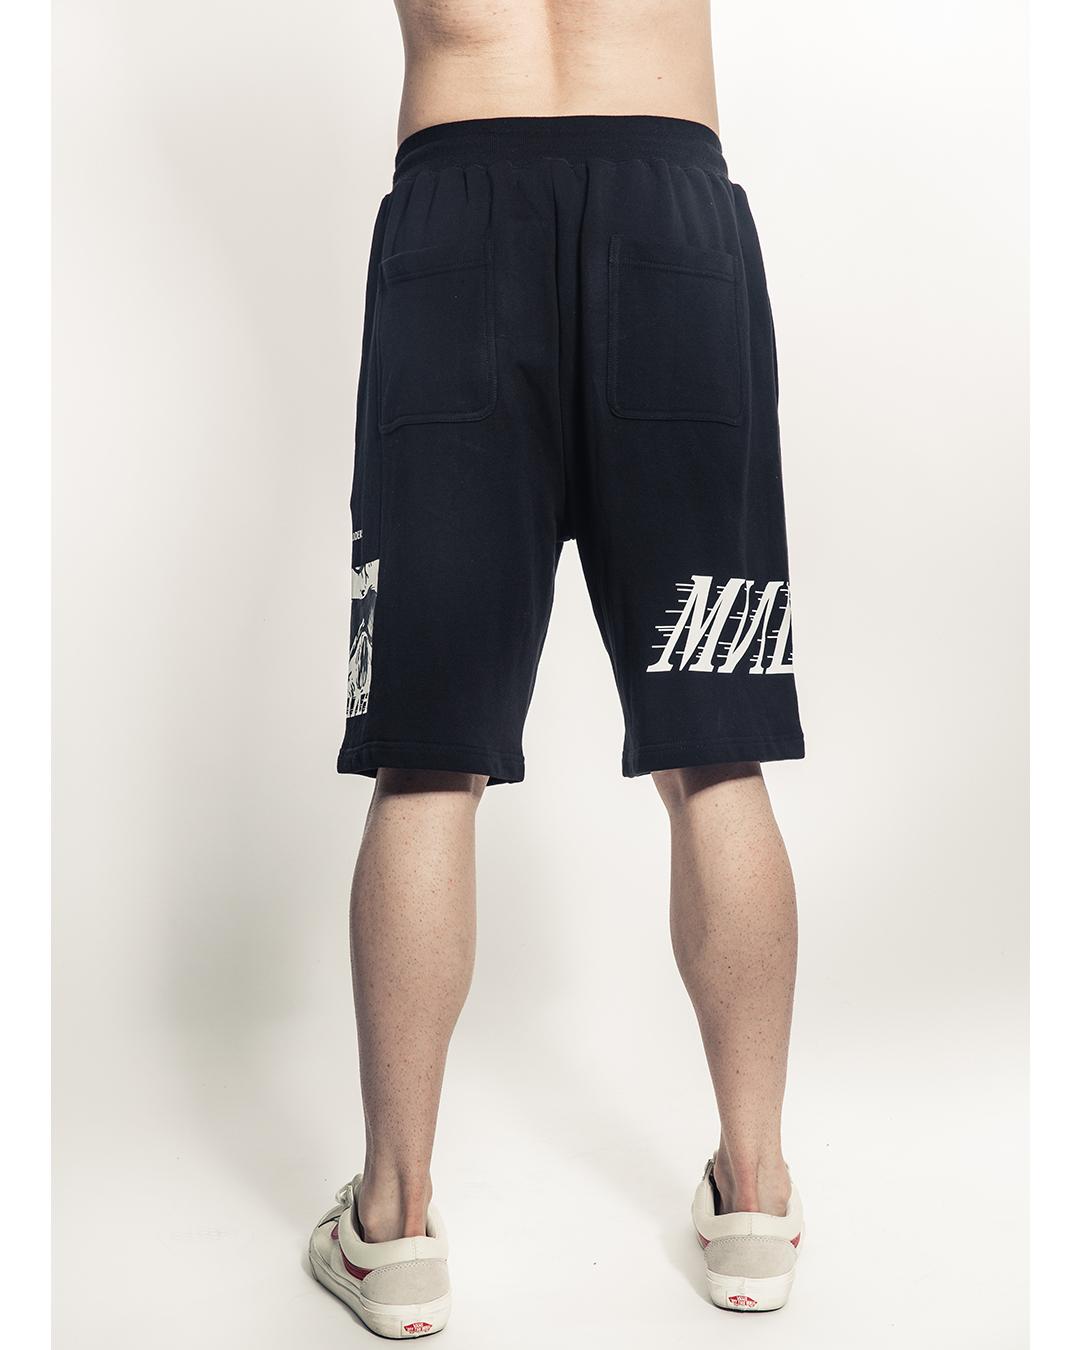 Simon Box Logo Shorts (Black)